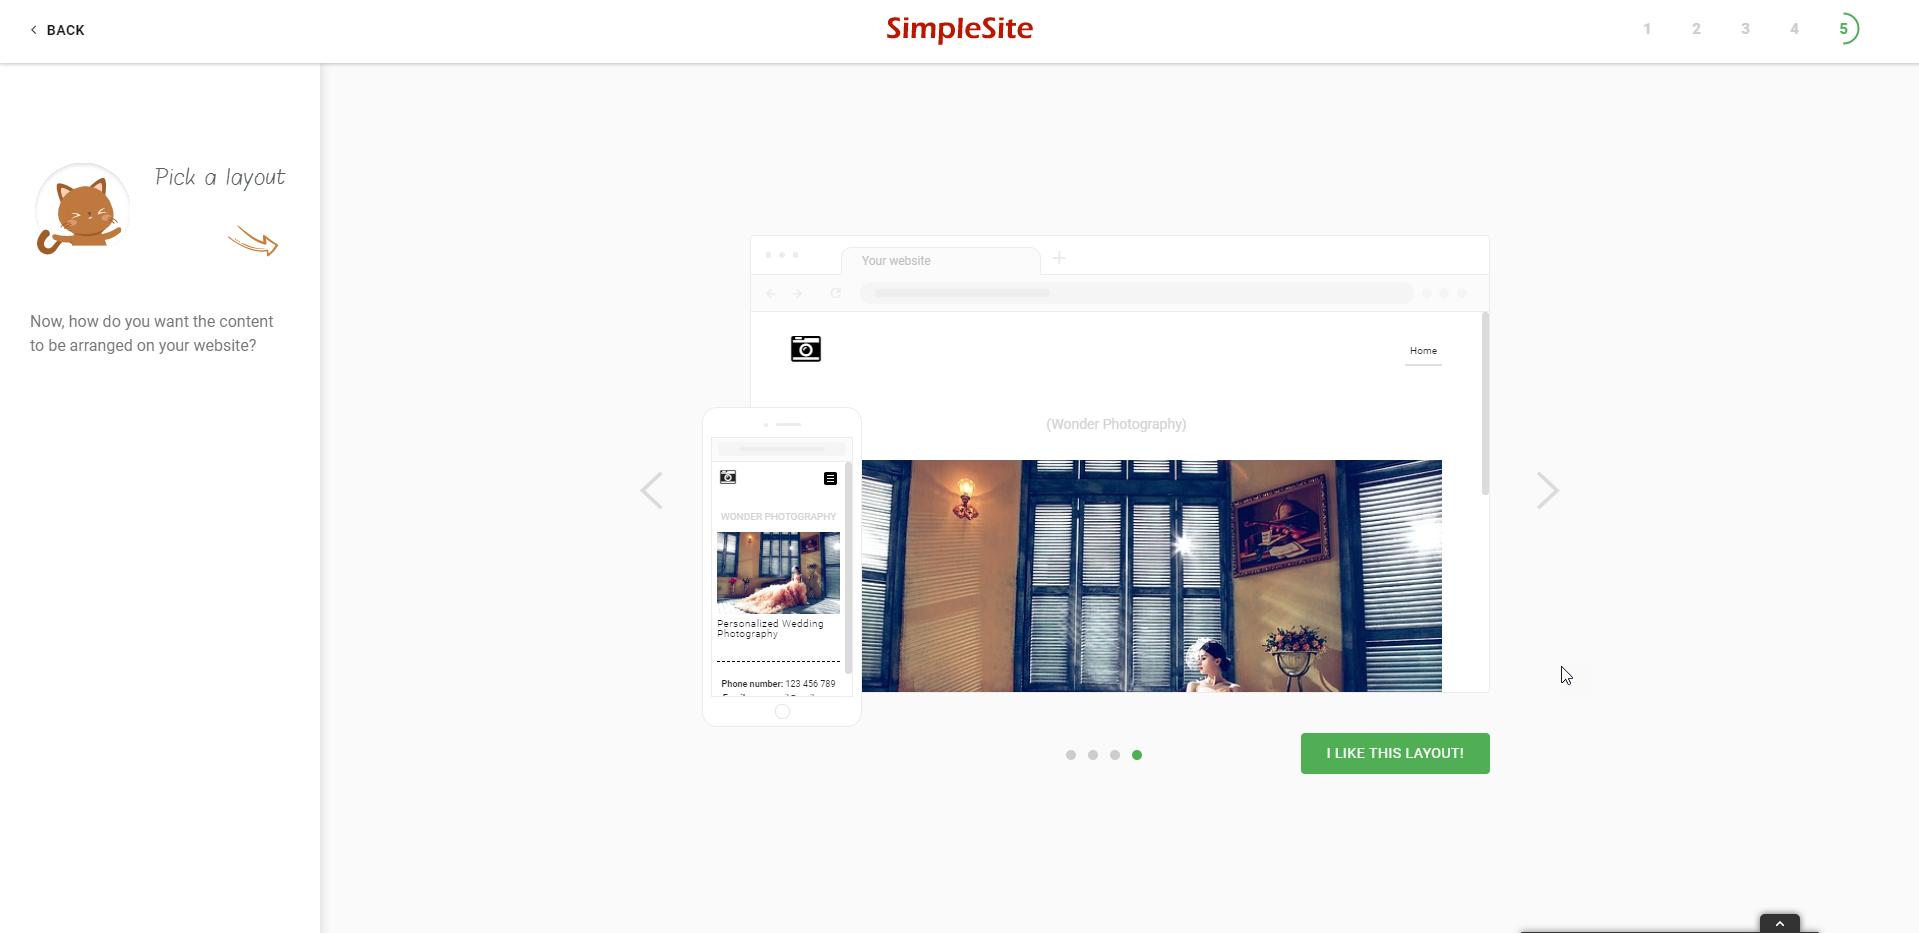 simplesite website layout